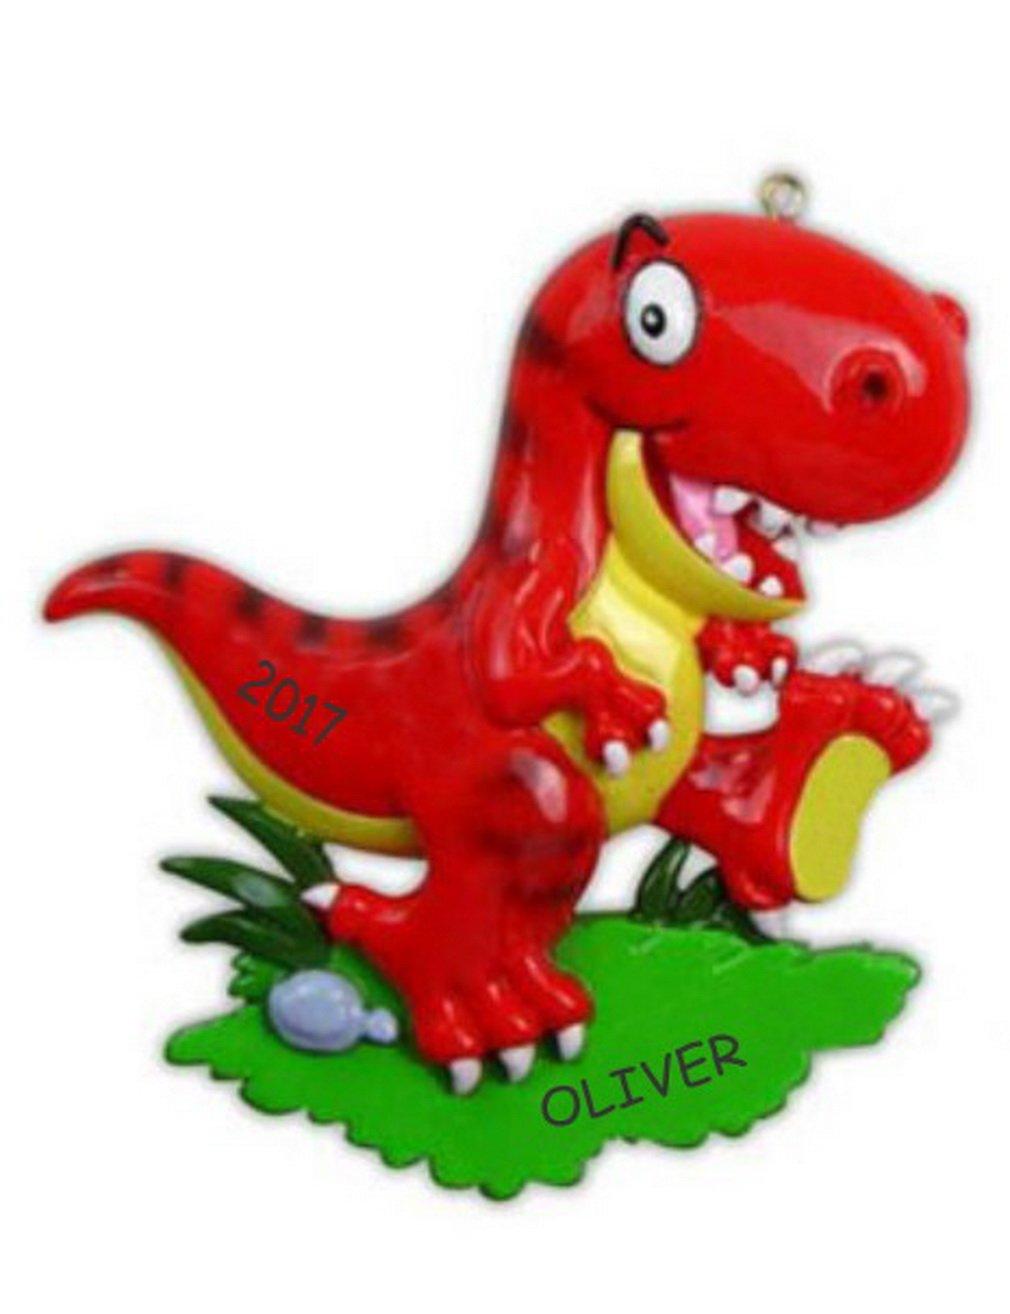 Personalized Dinosaur Christmas Ornament (T-Rex)